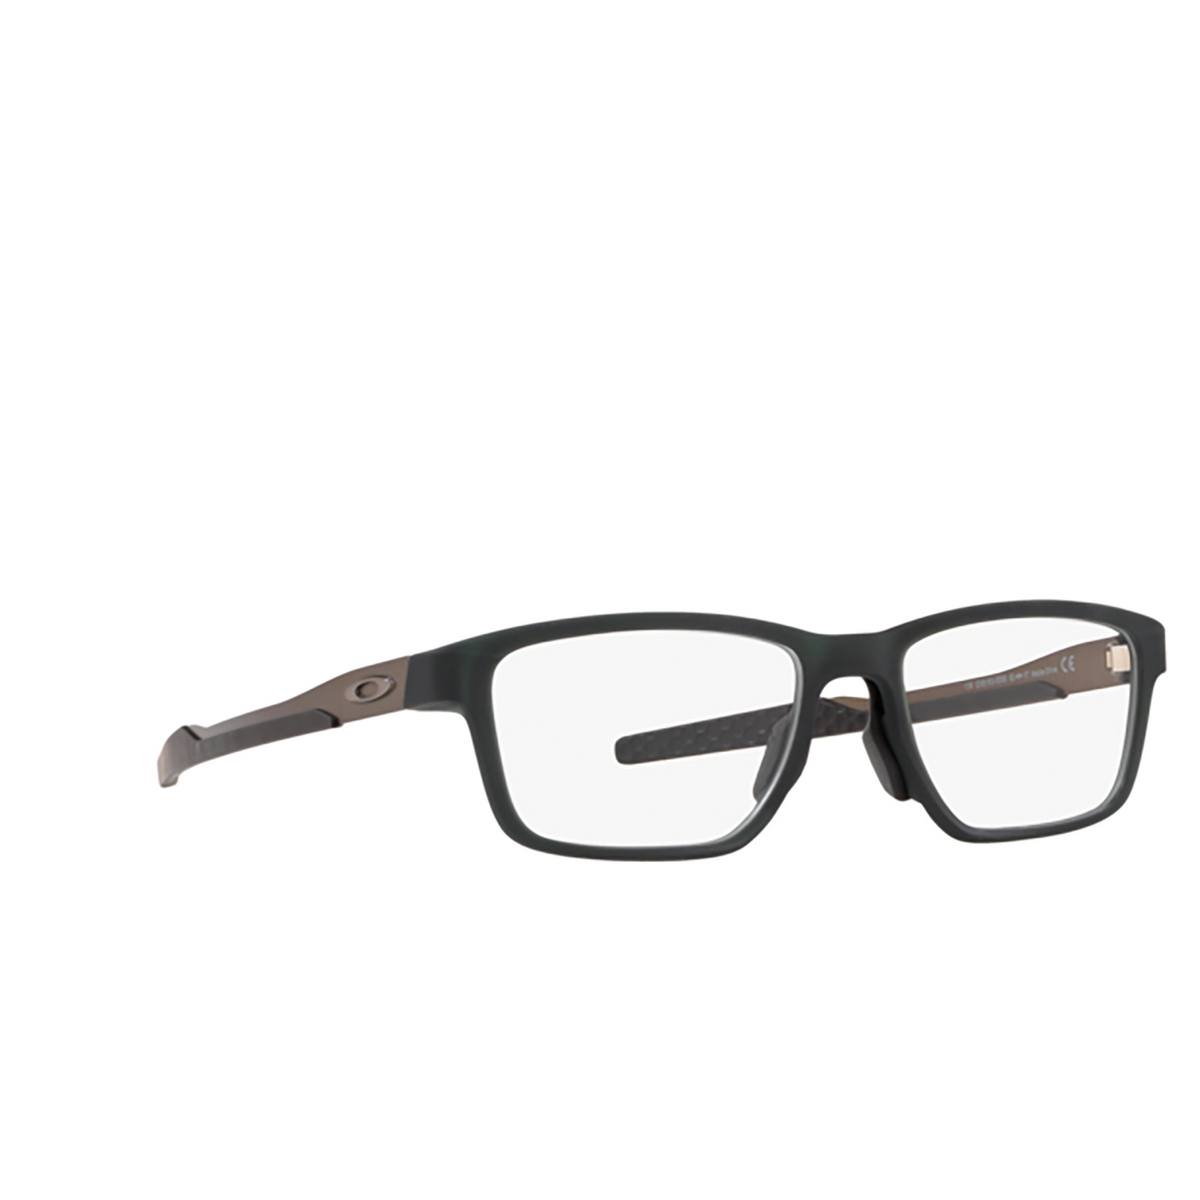 Oakley® Rectangle Eyeglasses: Metalink OX8153 color Matte Olive 815303 - three-quarters view.